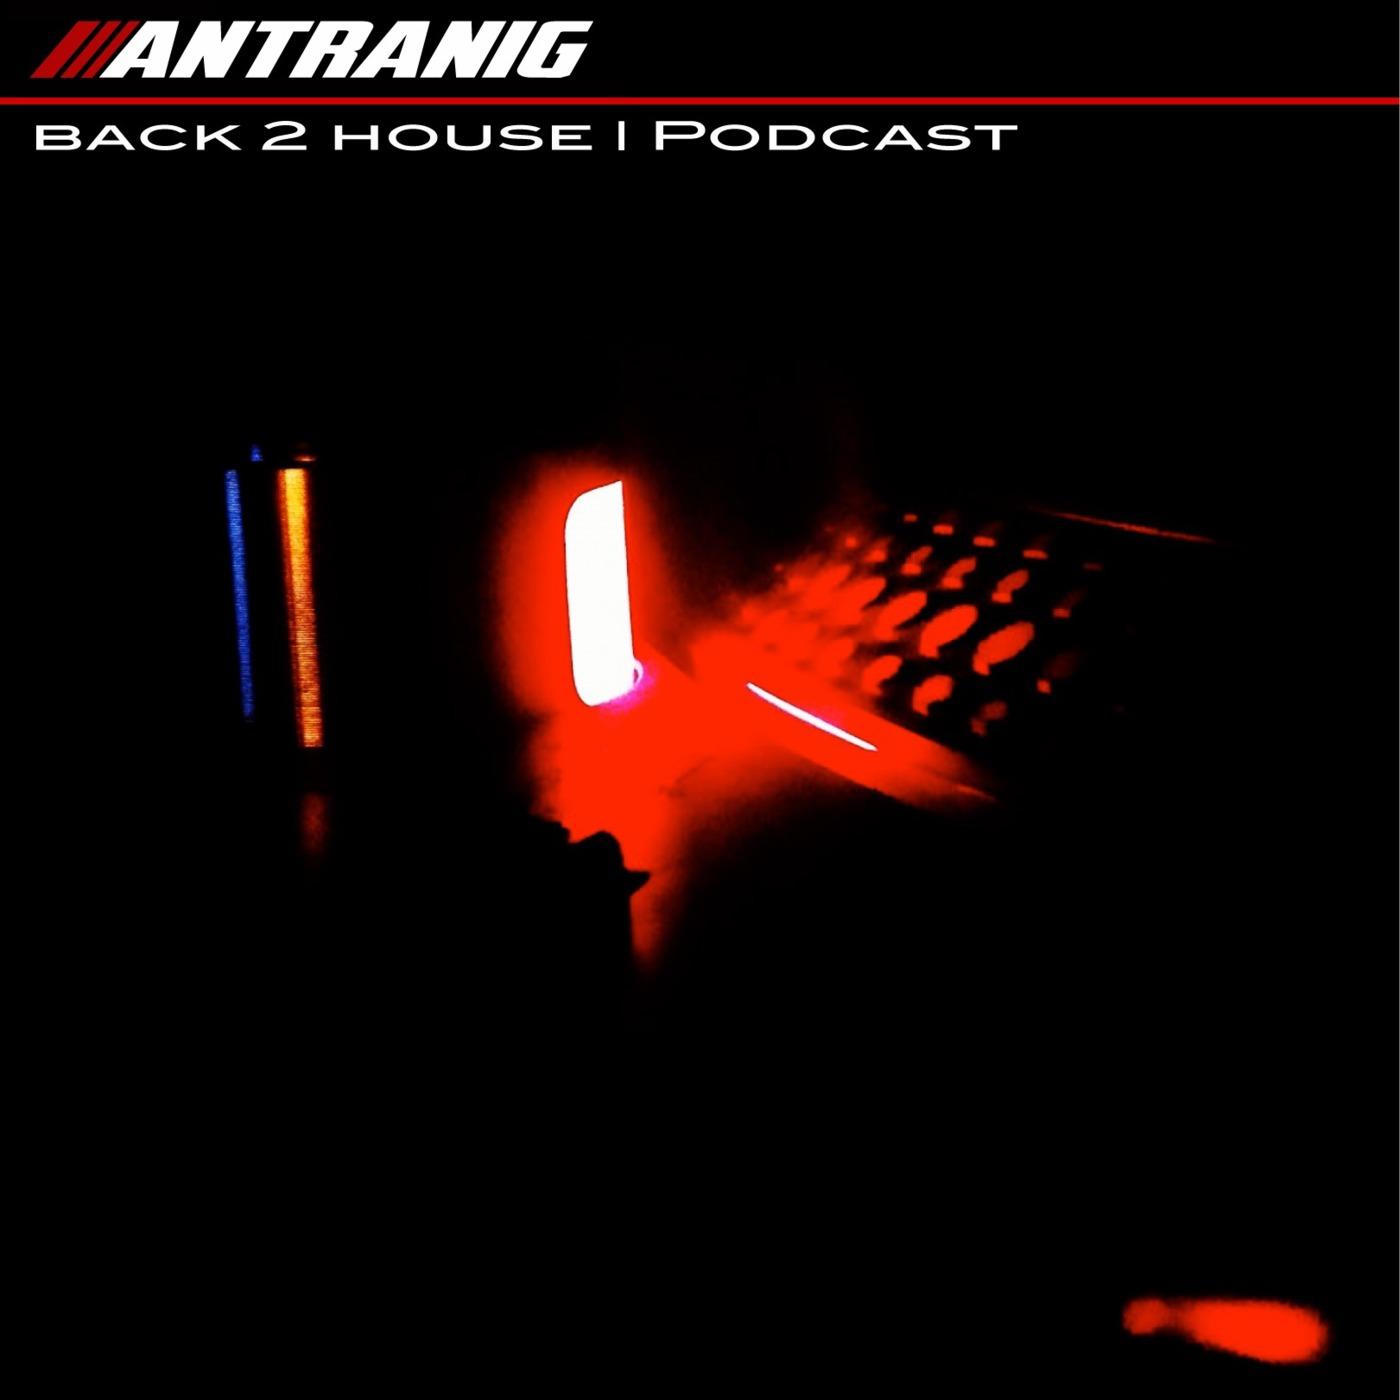 Antranig 'Back 2 House' Podcast